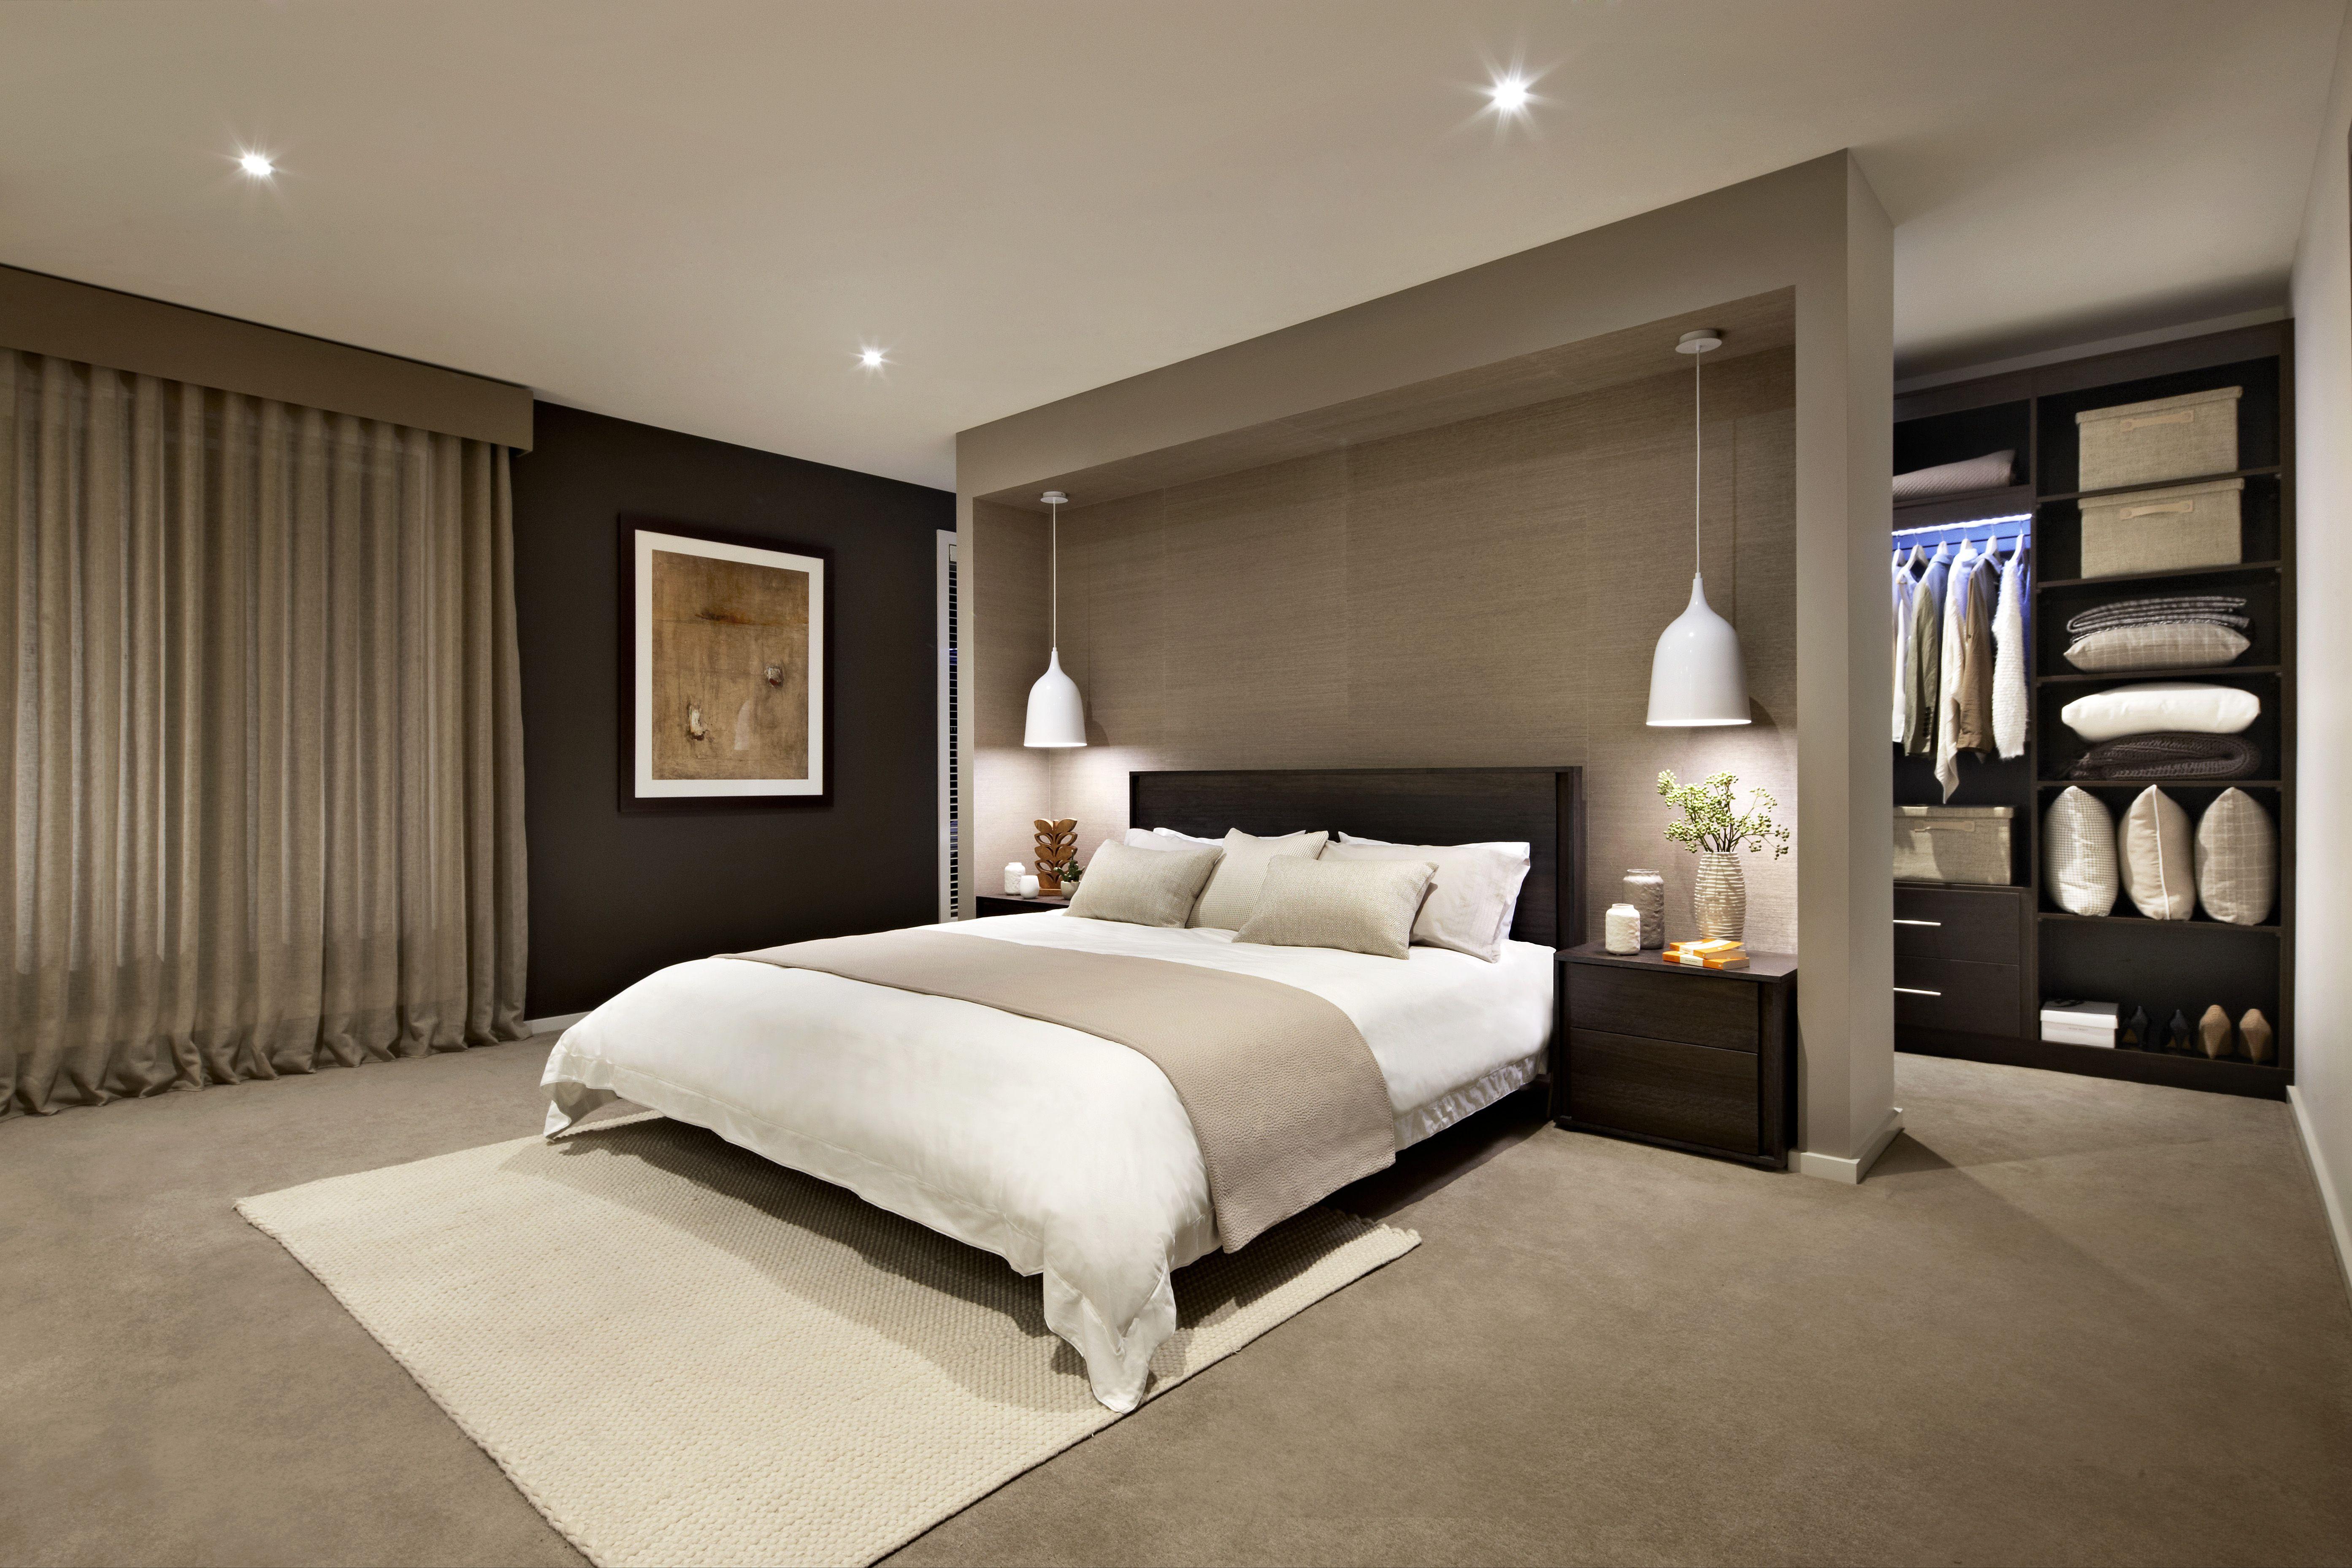 Schlafzimmer Wohnideen ~ Wohnideen schlafzimmer den platz hinterm bett verwerten